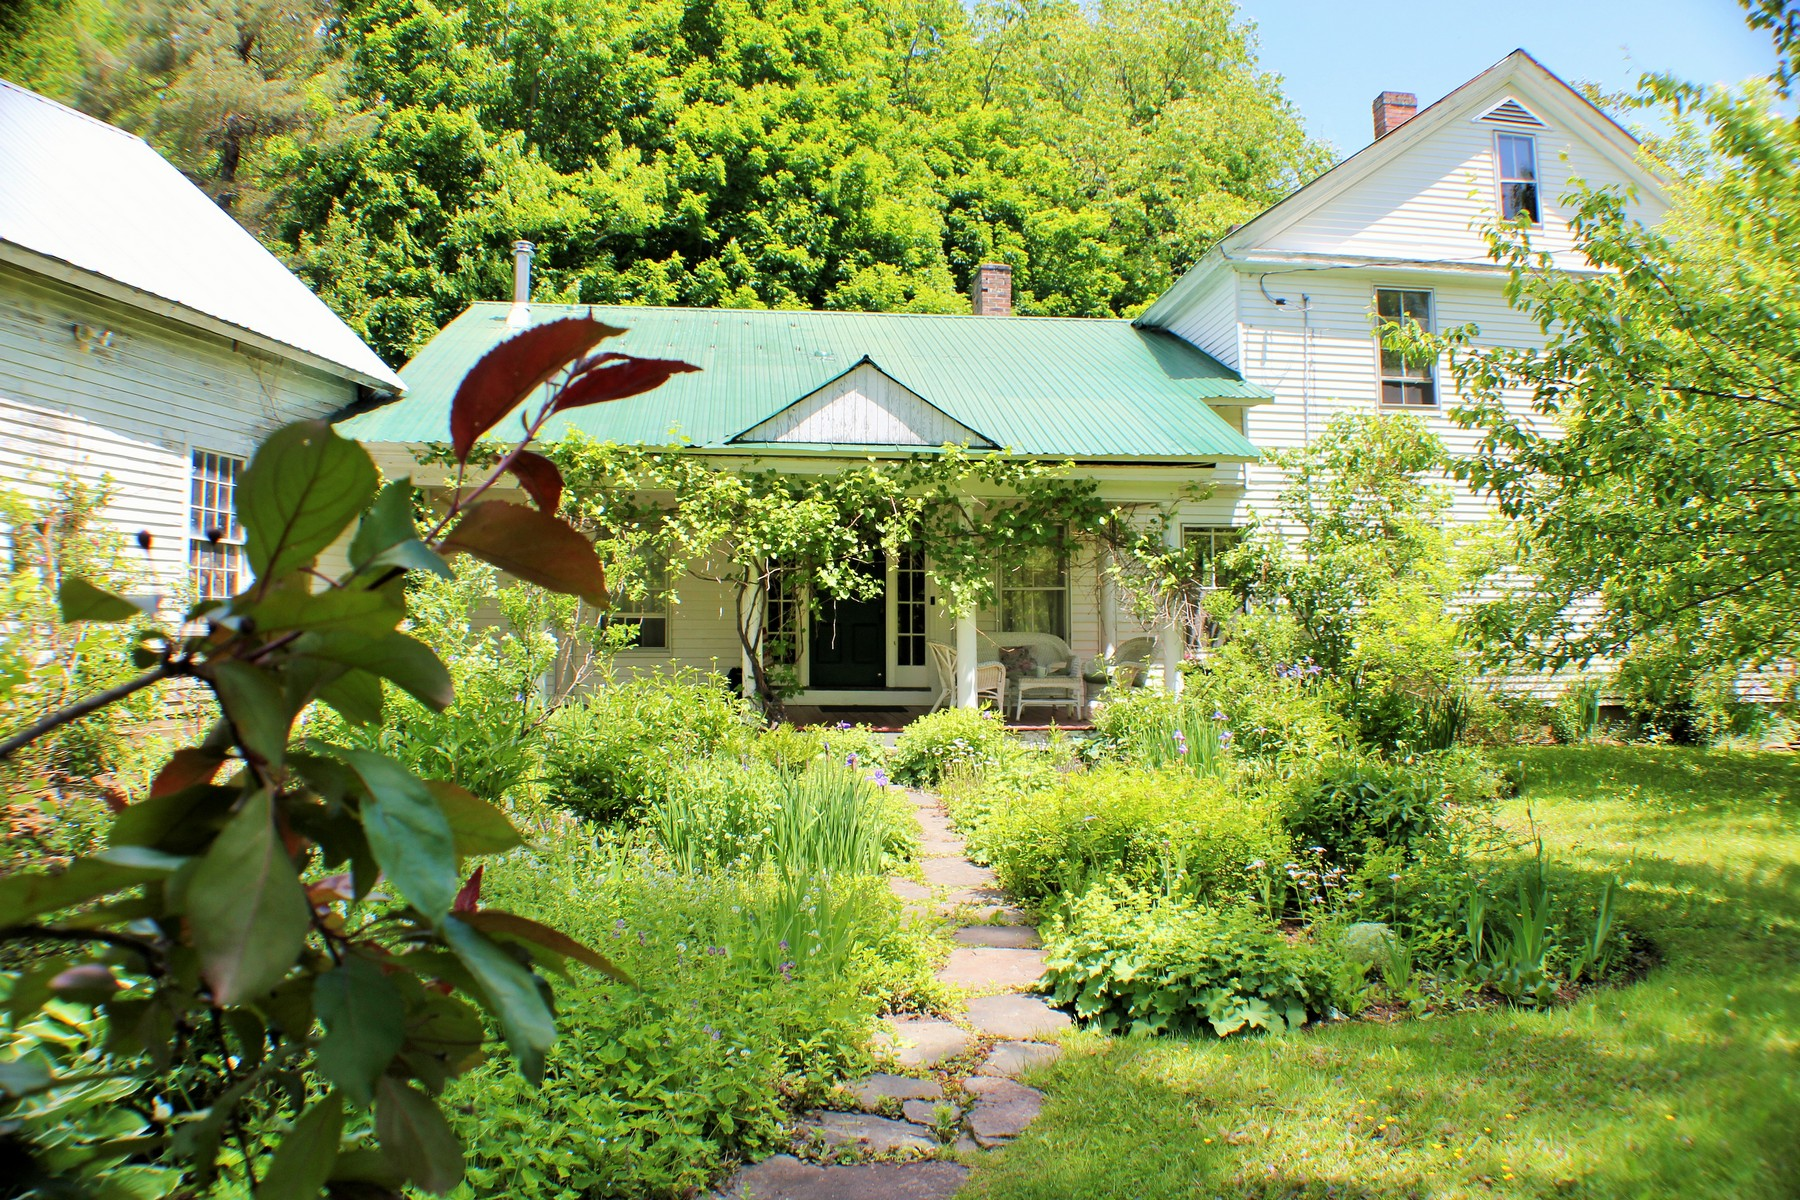 Villa per Vendita alle ore 28 Elm Street, Cabot Cabot, Vermont 05647 Stati Uniti